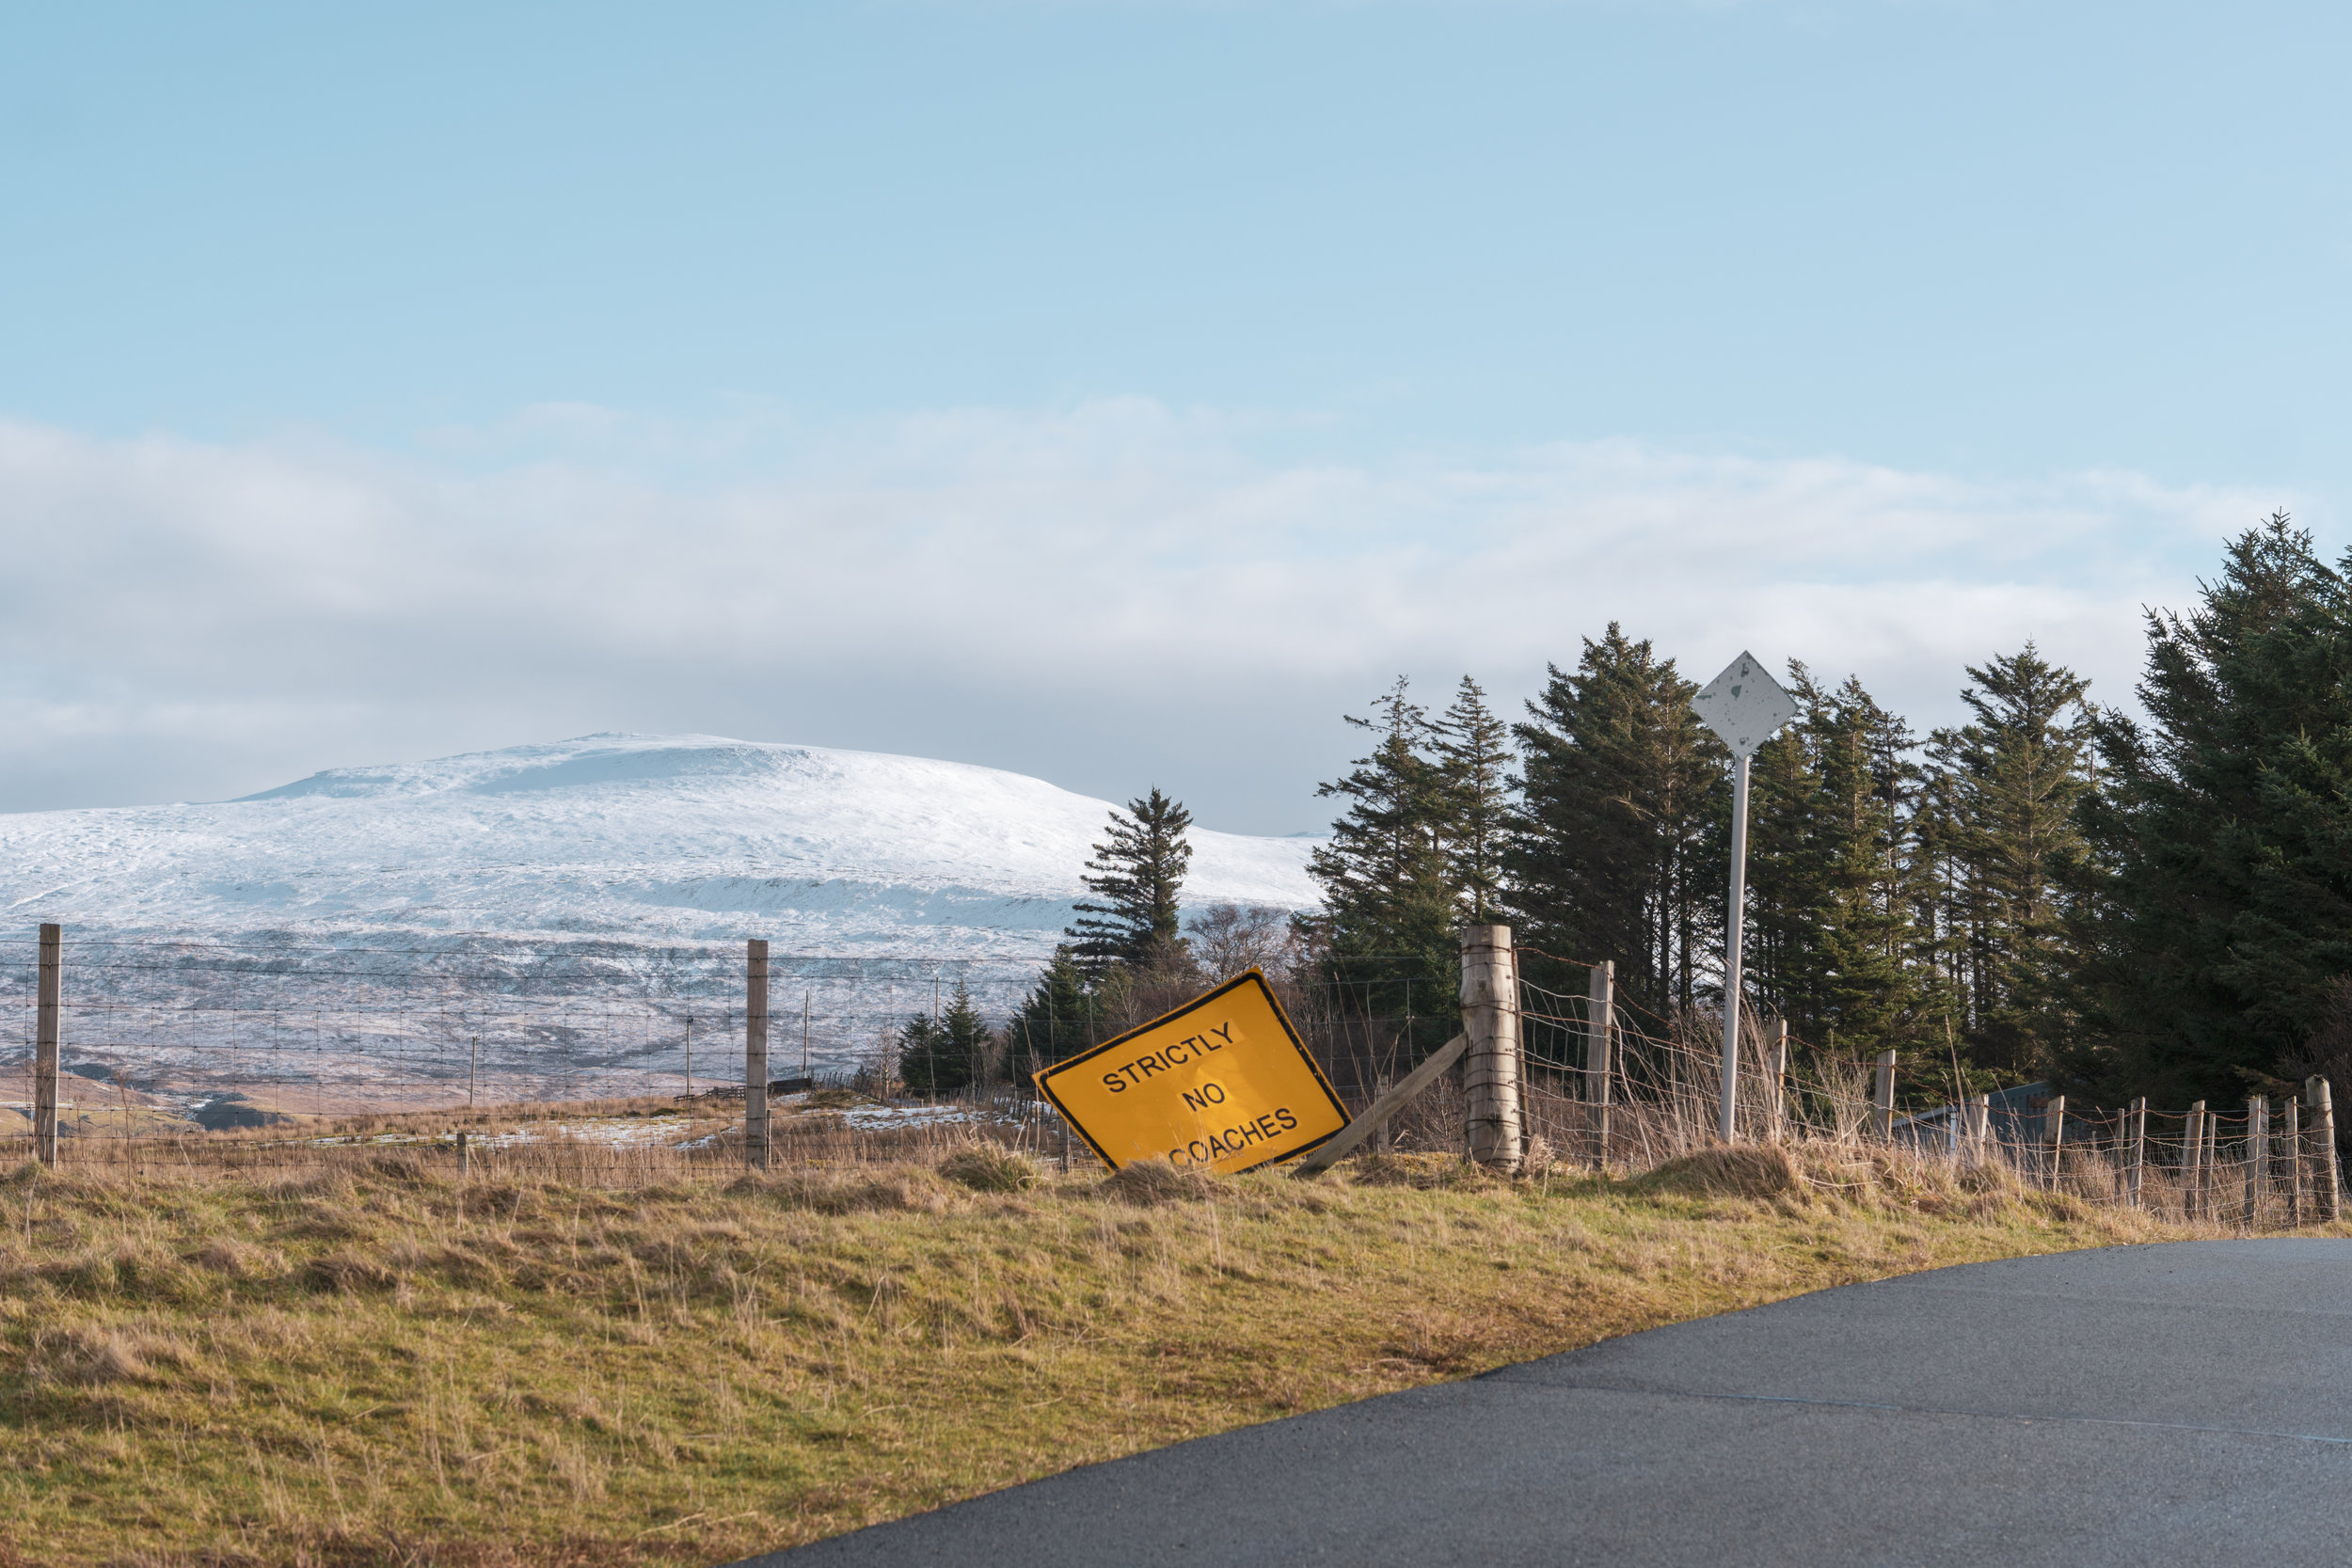 Isle-of-Skye-Fairy-Glen-und-Braes (10).jpg